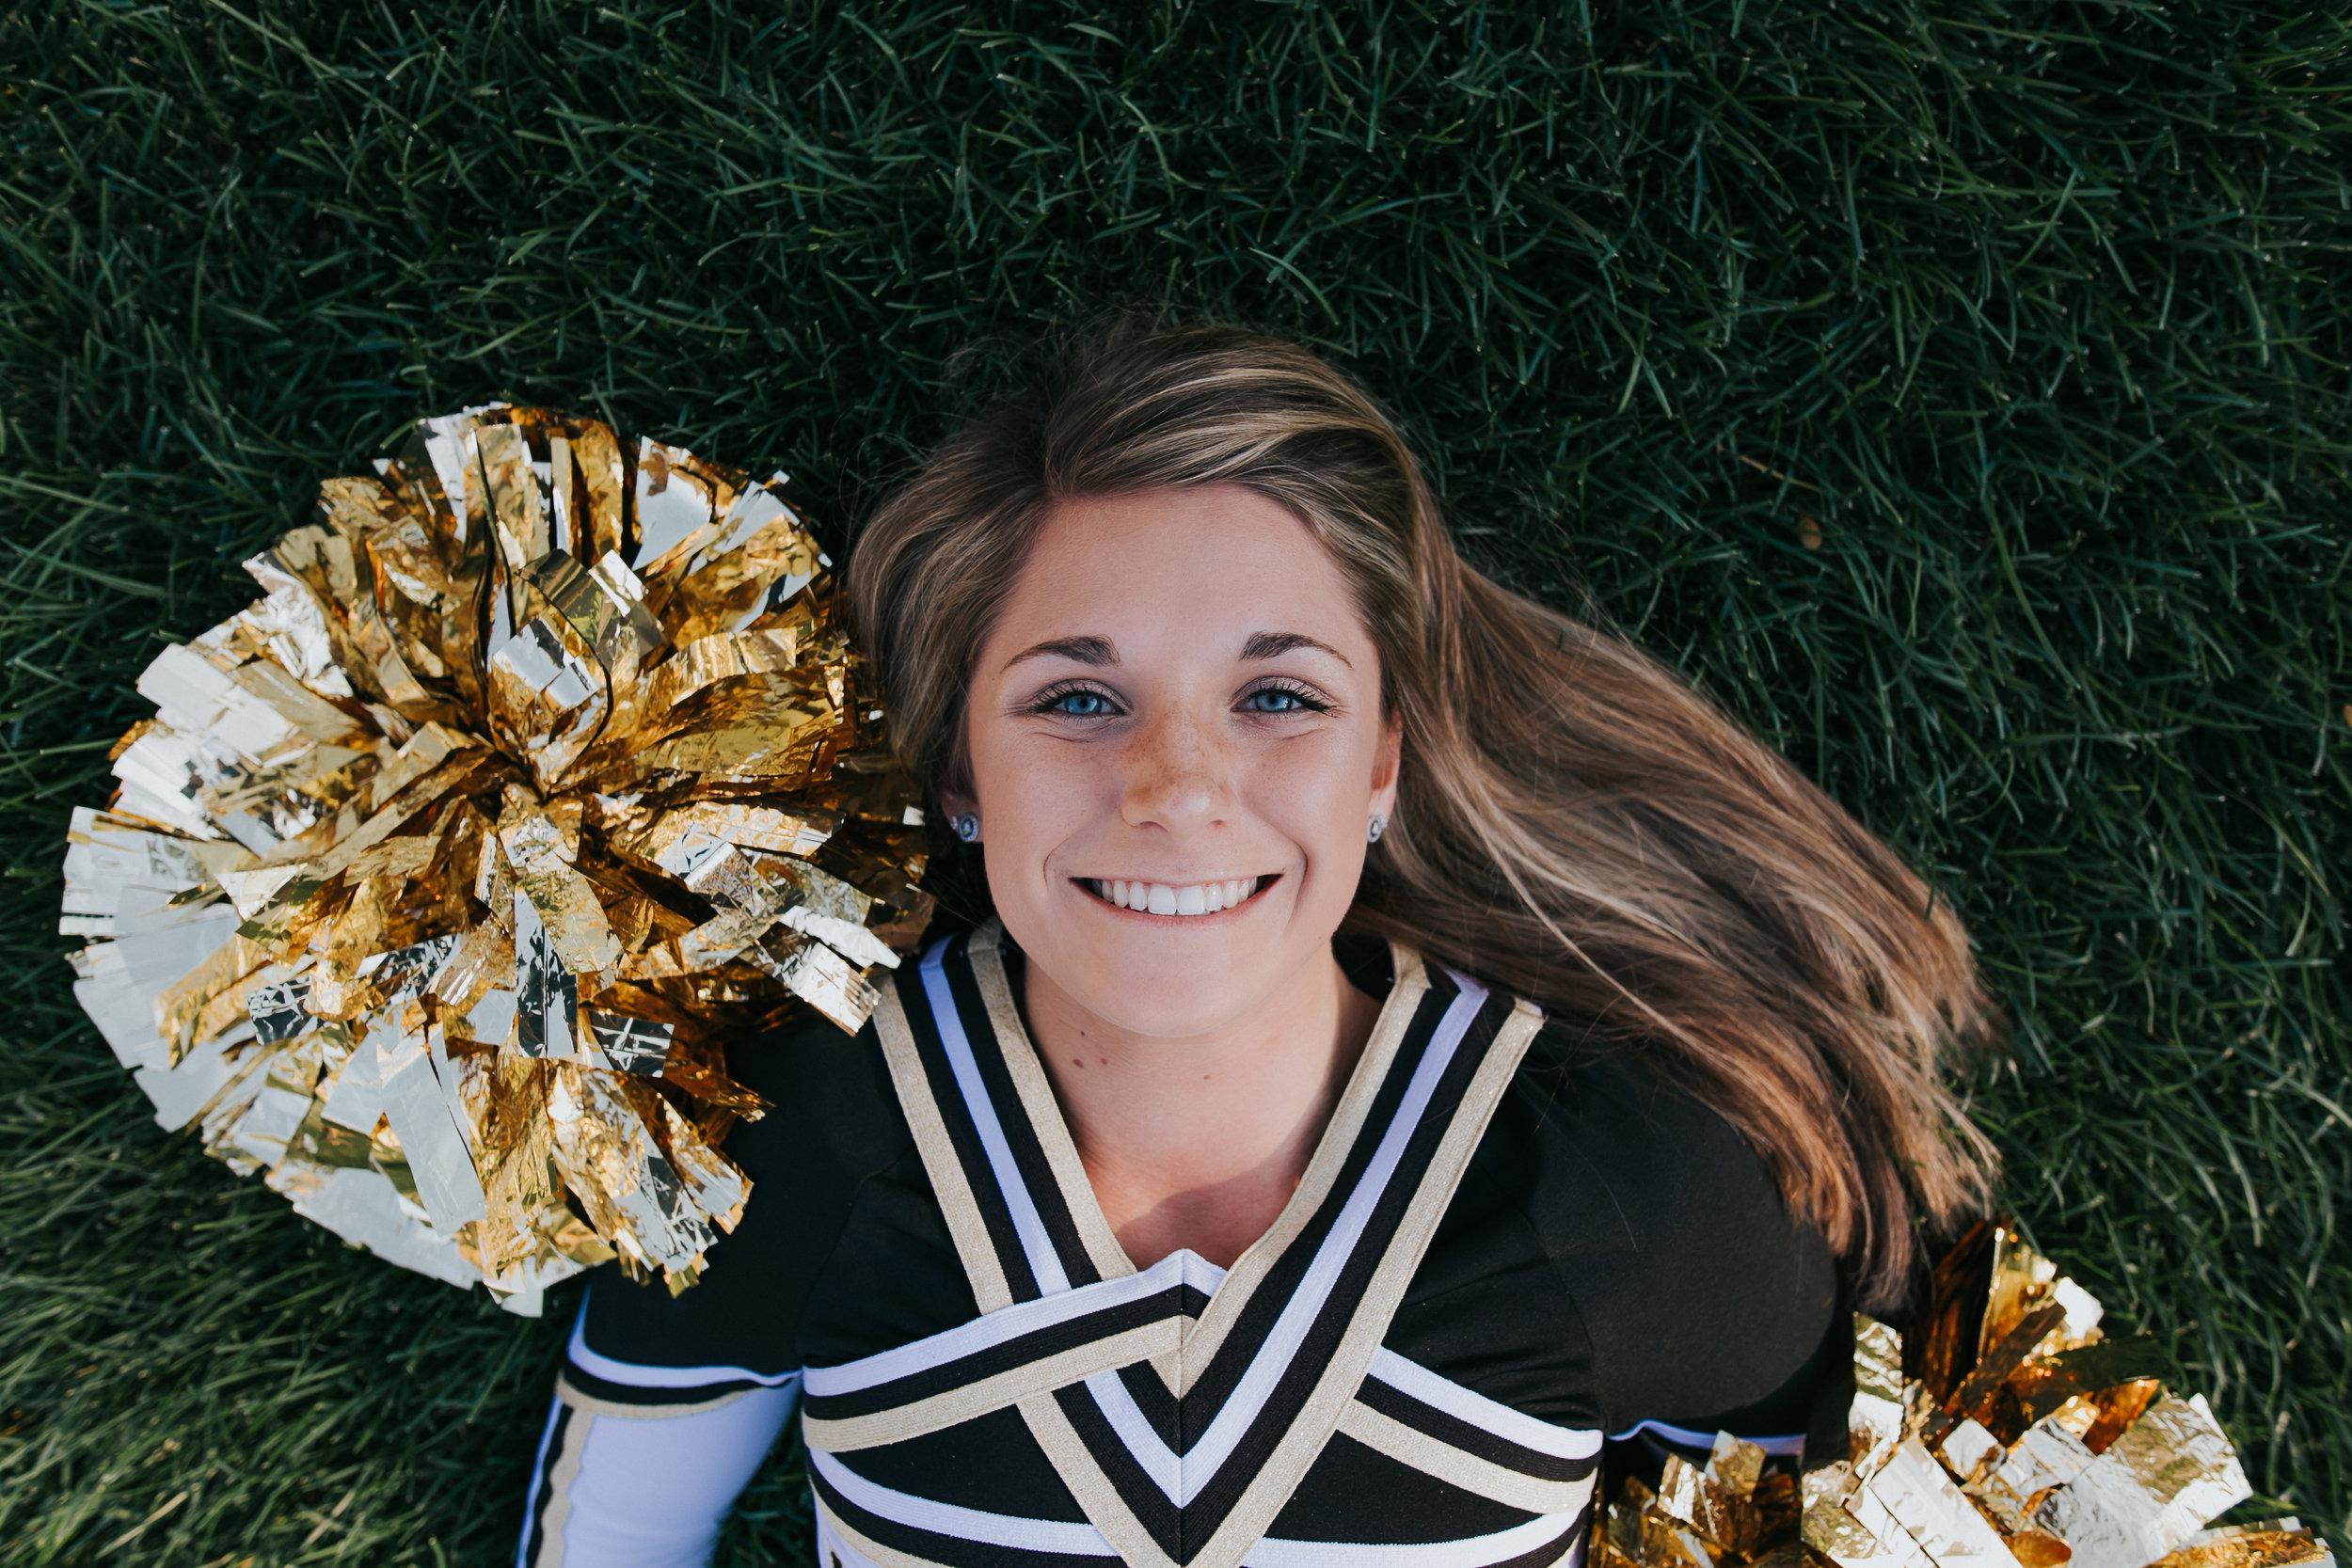 Senior Pictures at the University of Notre Dame, Cheerleader, Penn High School, Pom Poms